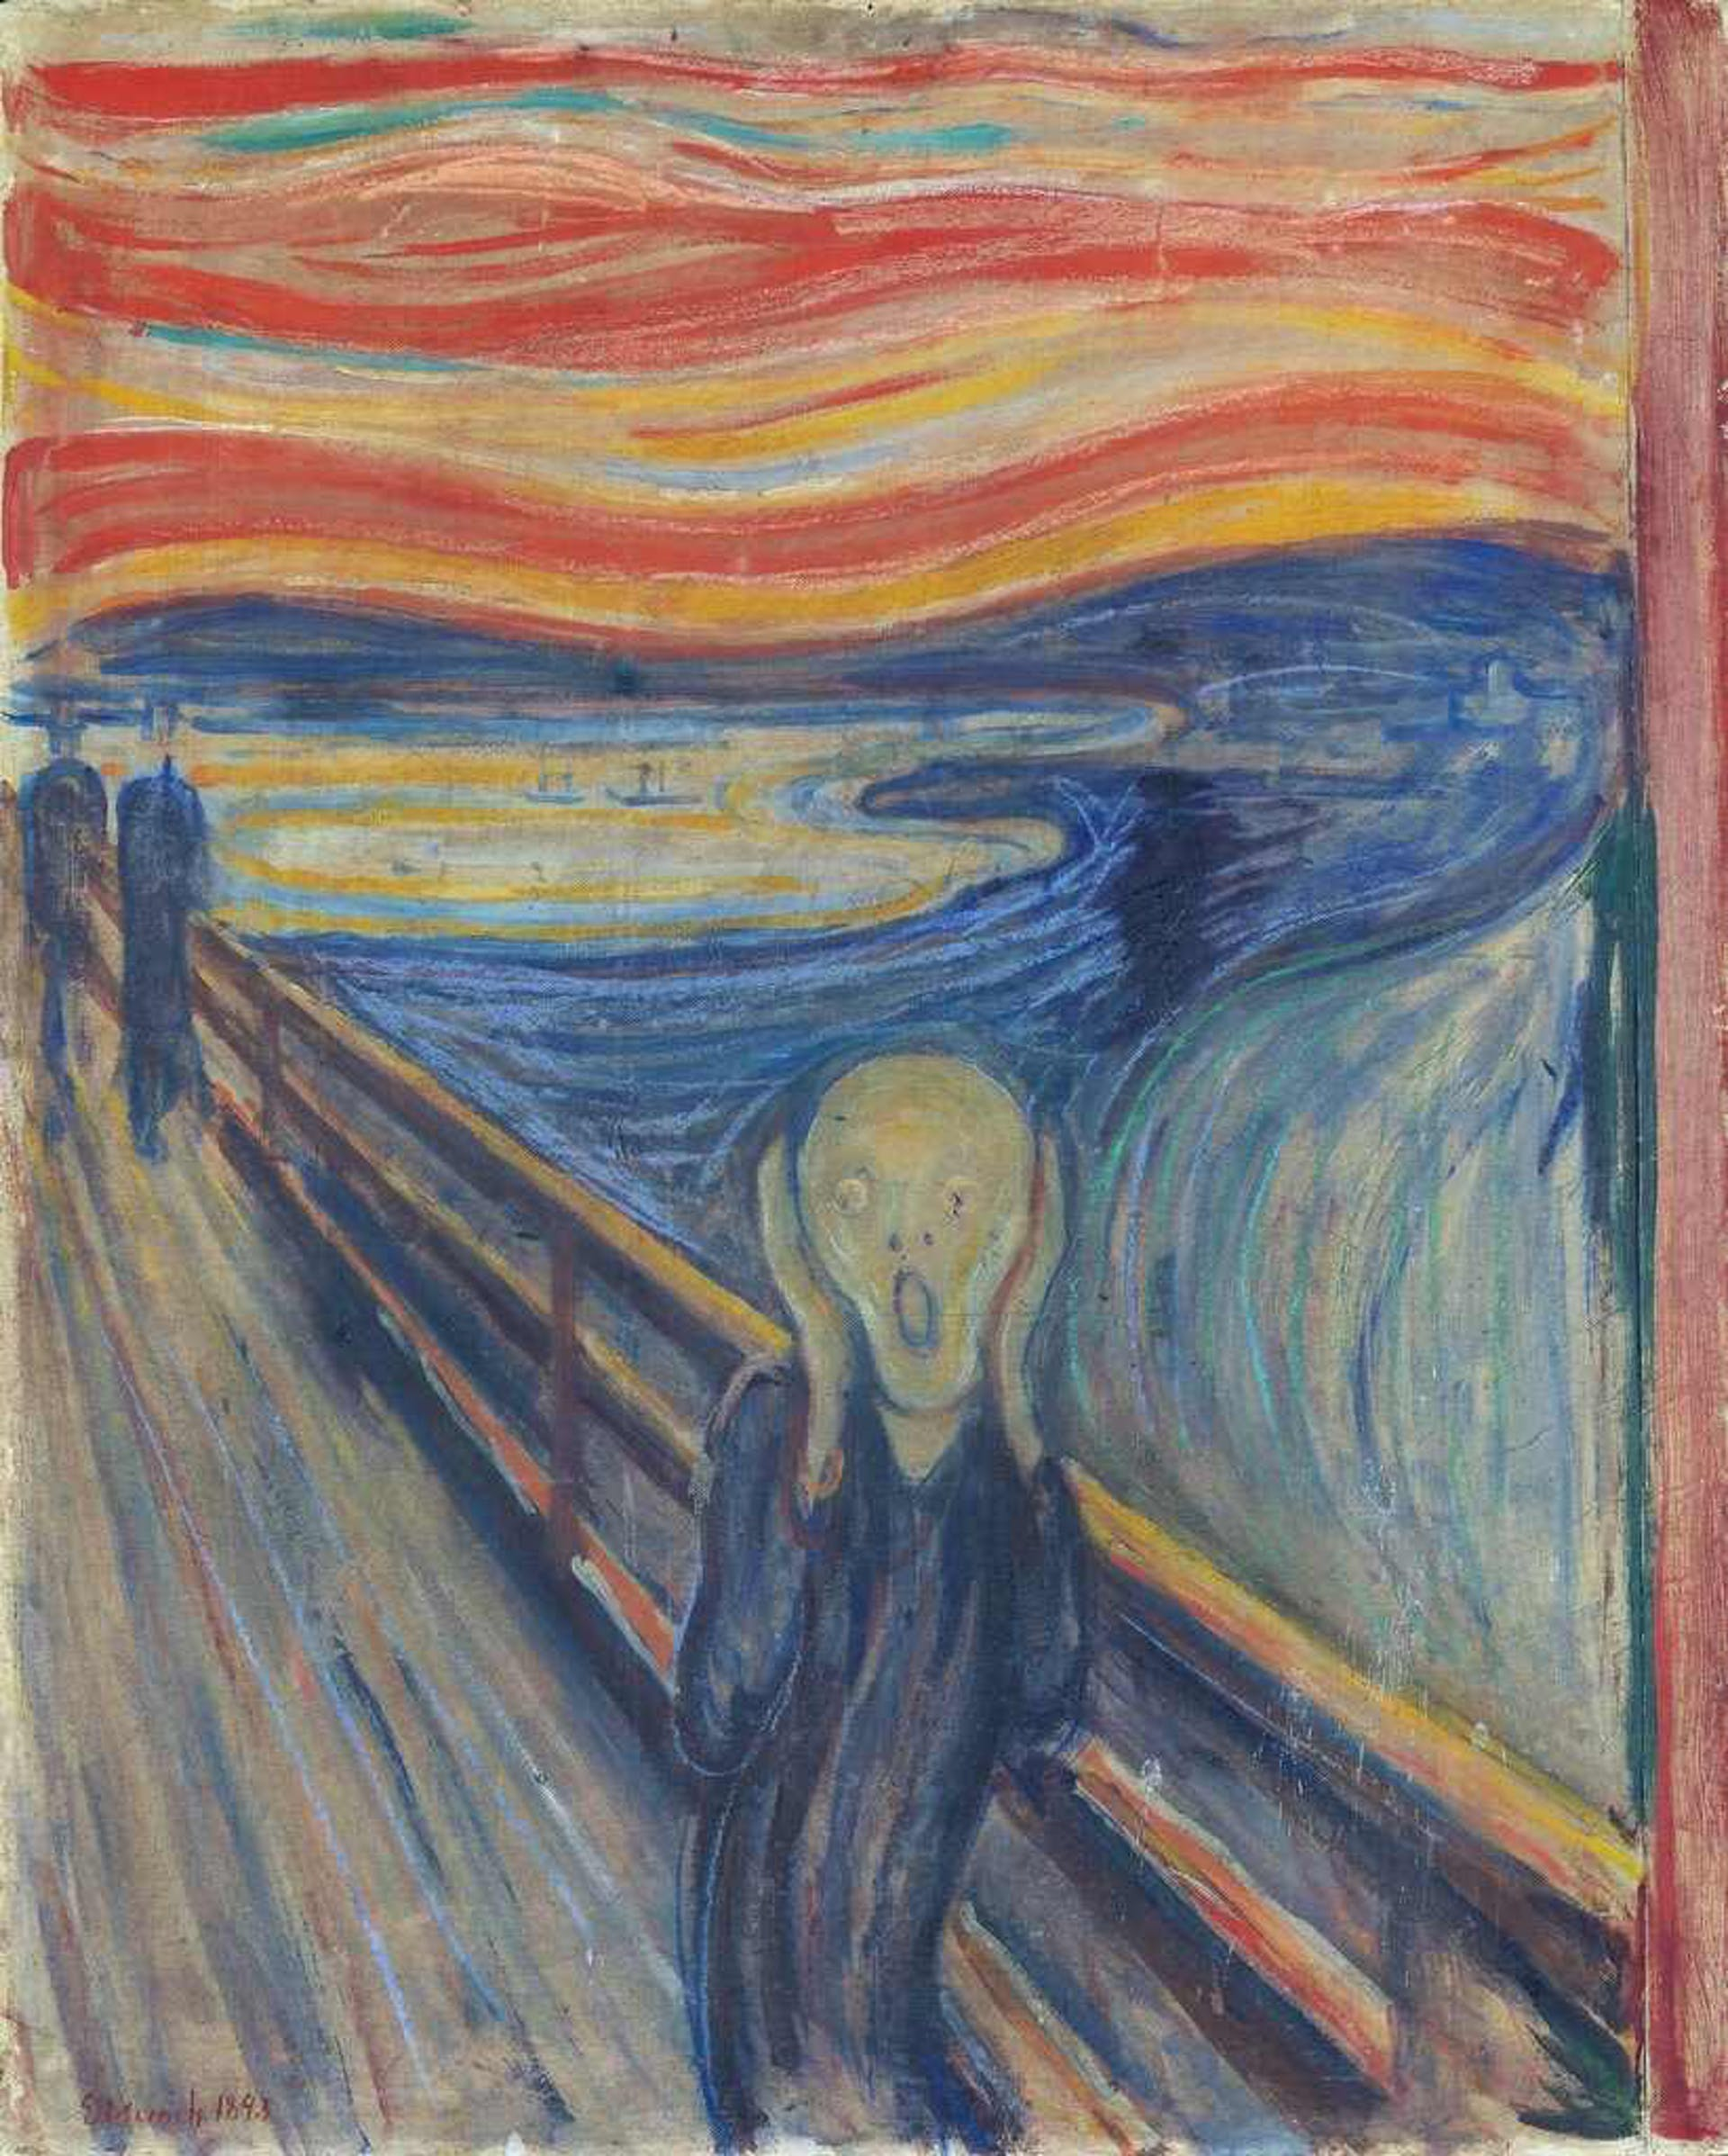 ¿Edvard Munch 'vandalizó' su propia obra?